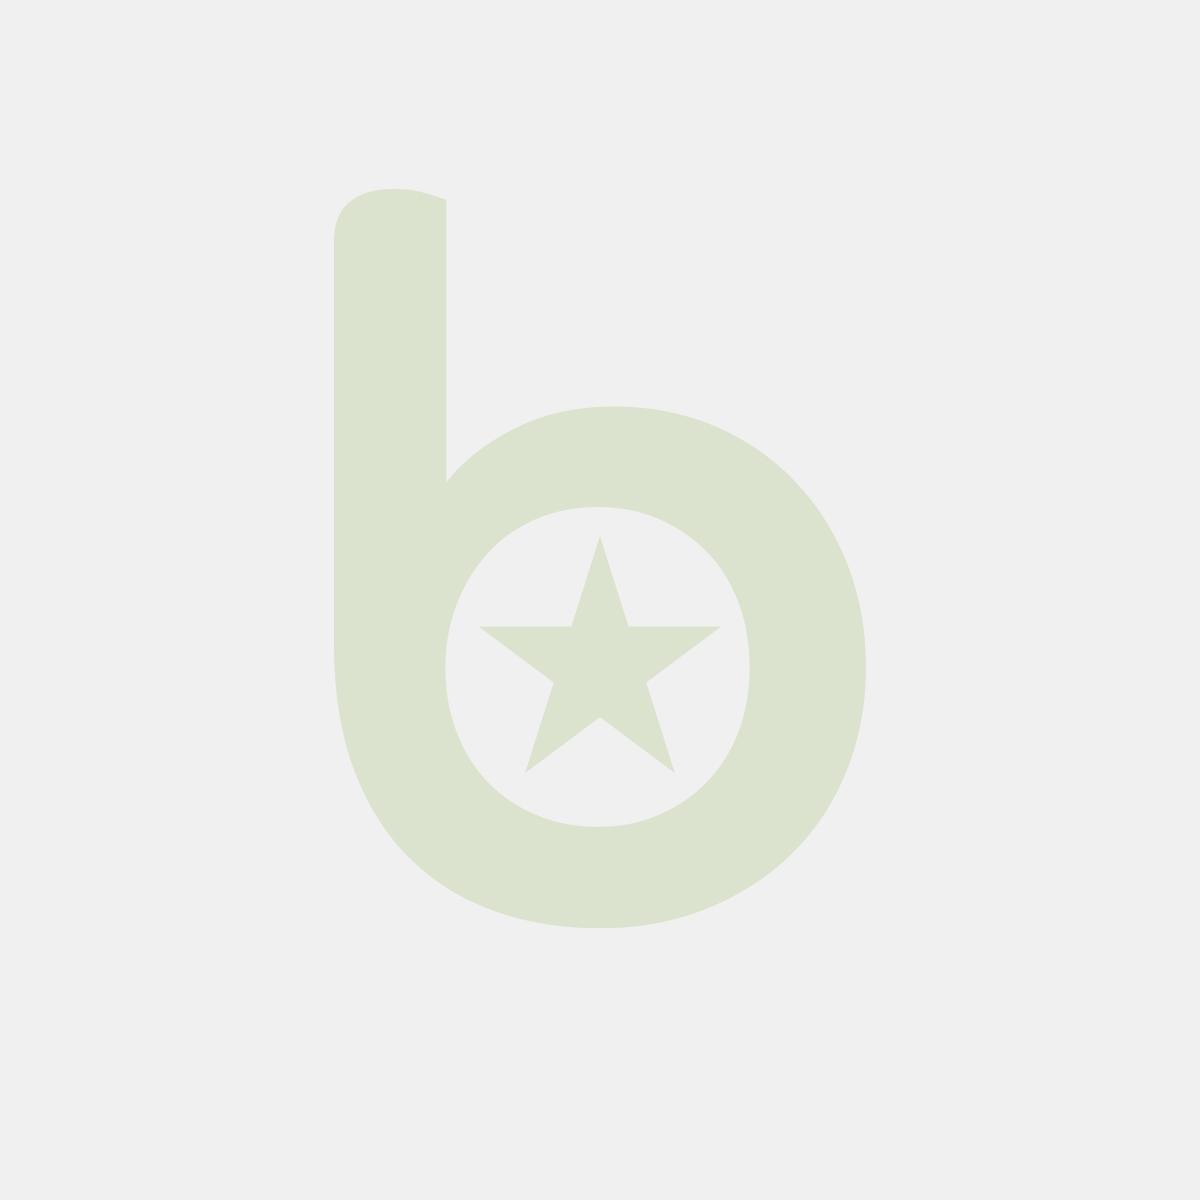 LUCART dyspenser serwetek TableTop N4 stojący, czarno - szary